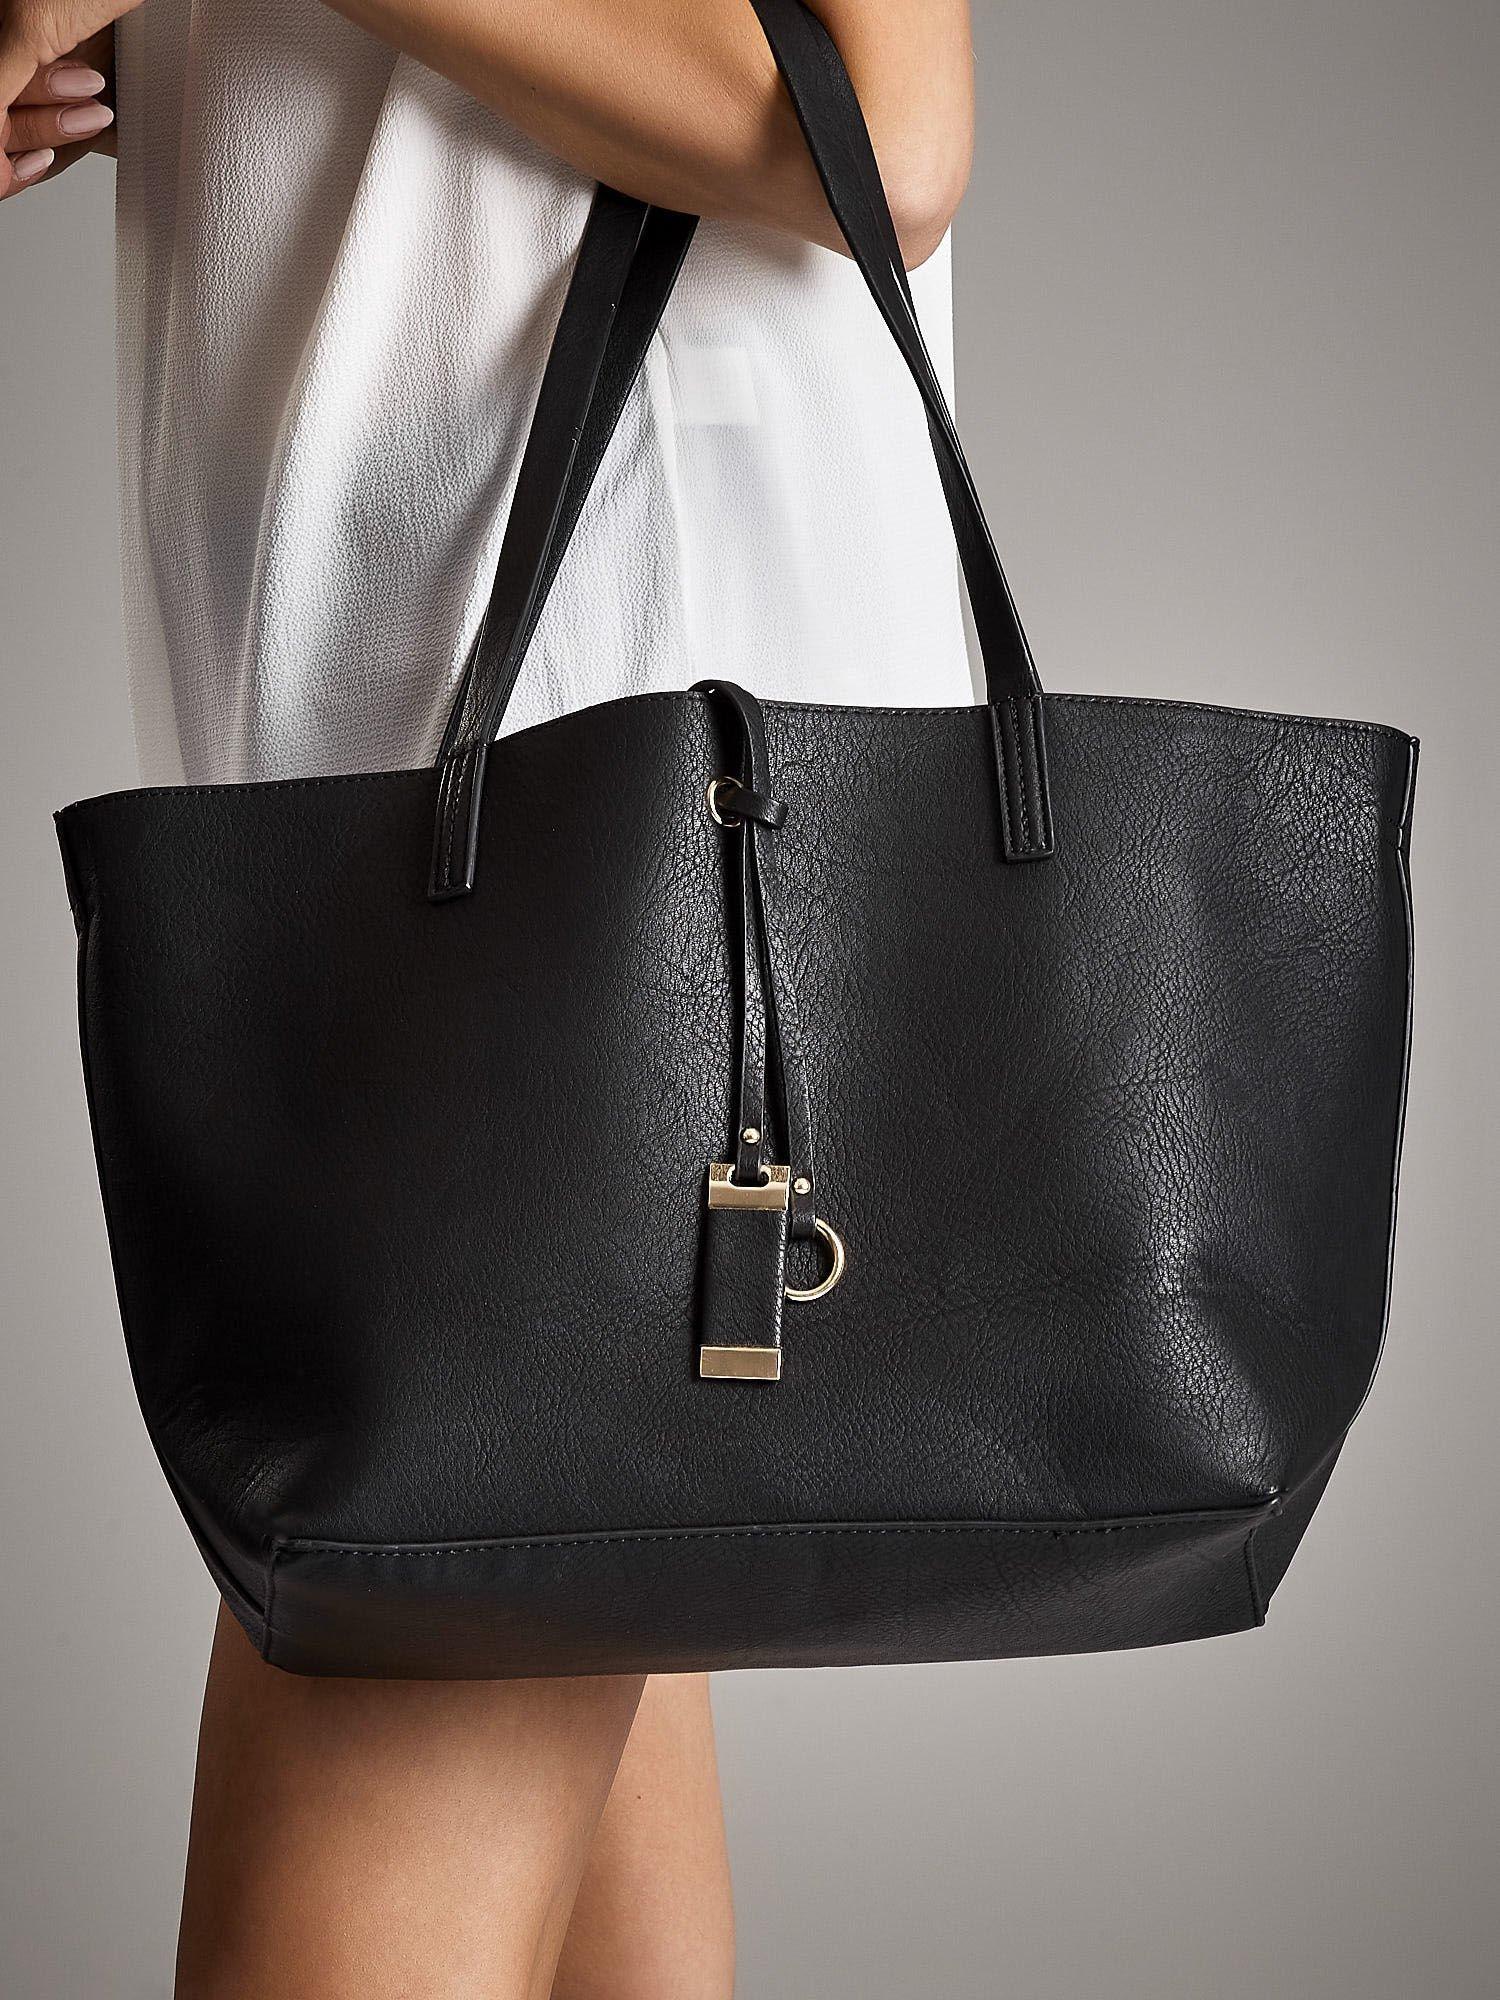 d7b086da12d92 ANNA FIELD Czarna torba shopper bag - Akcesoria torba - sklep eButik.pl